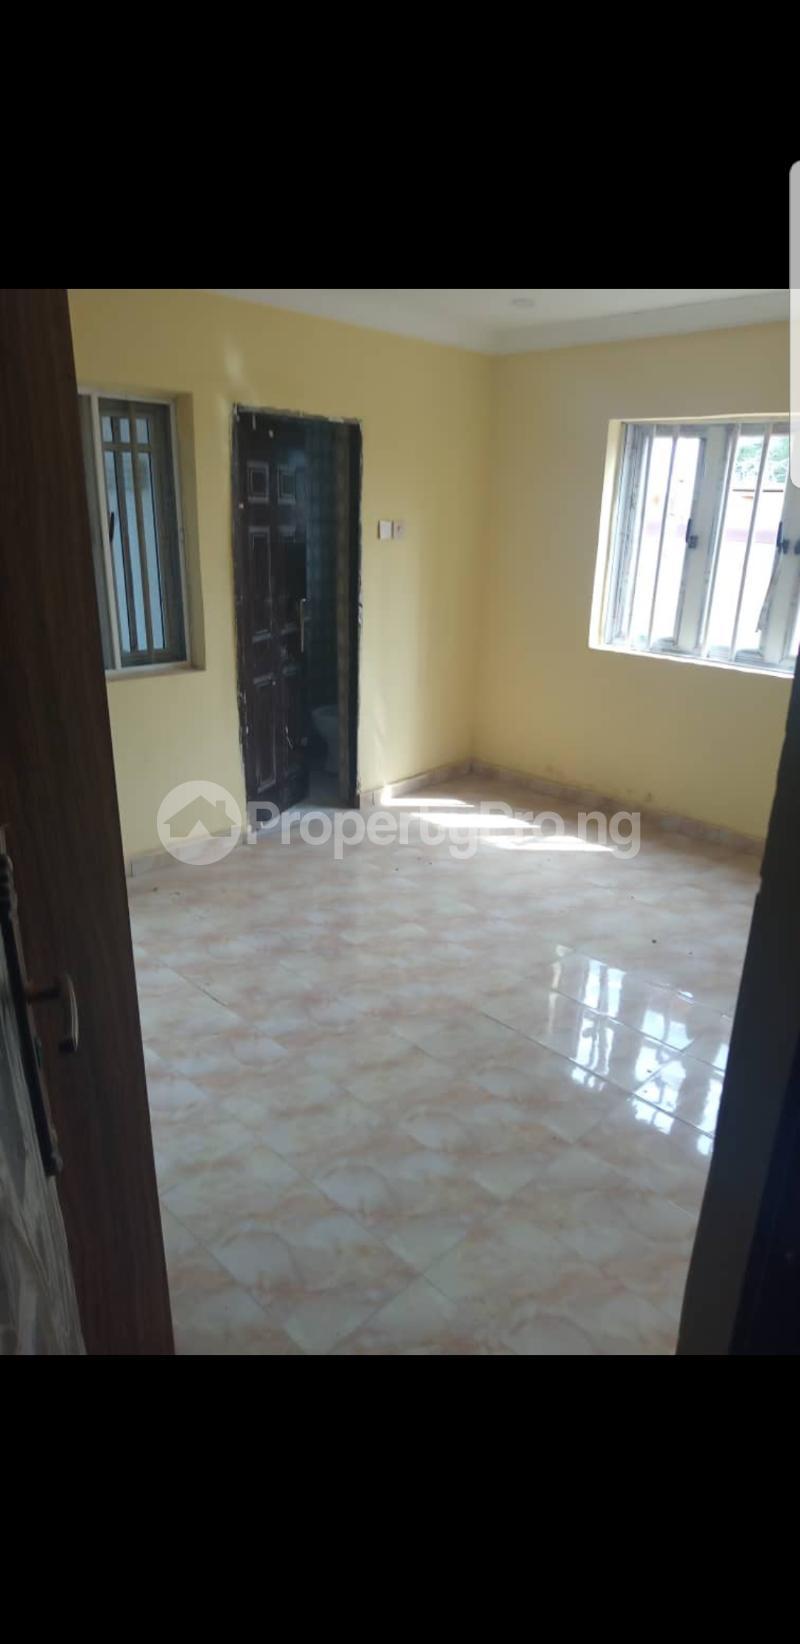 3 bedroom Shared Apartment Flat / Apartment for rent Enugu Enugu - 7